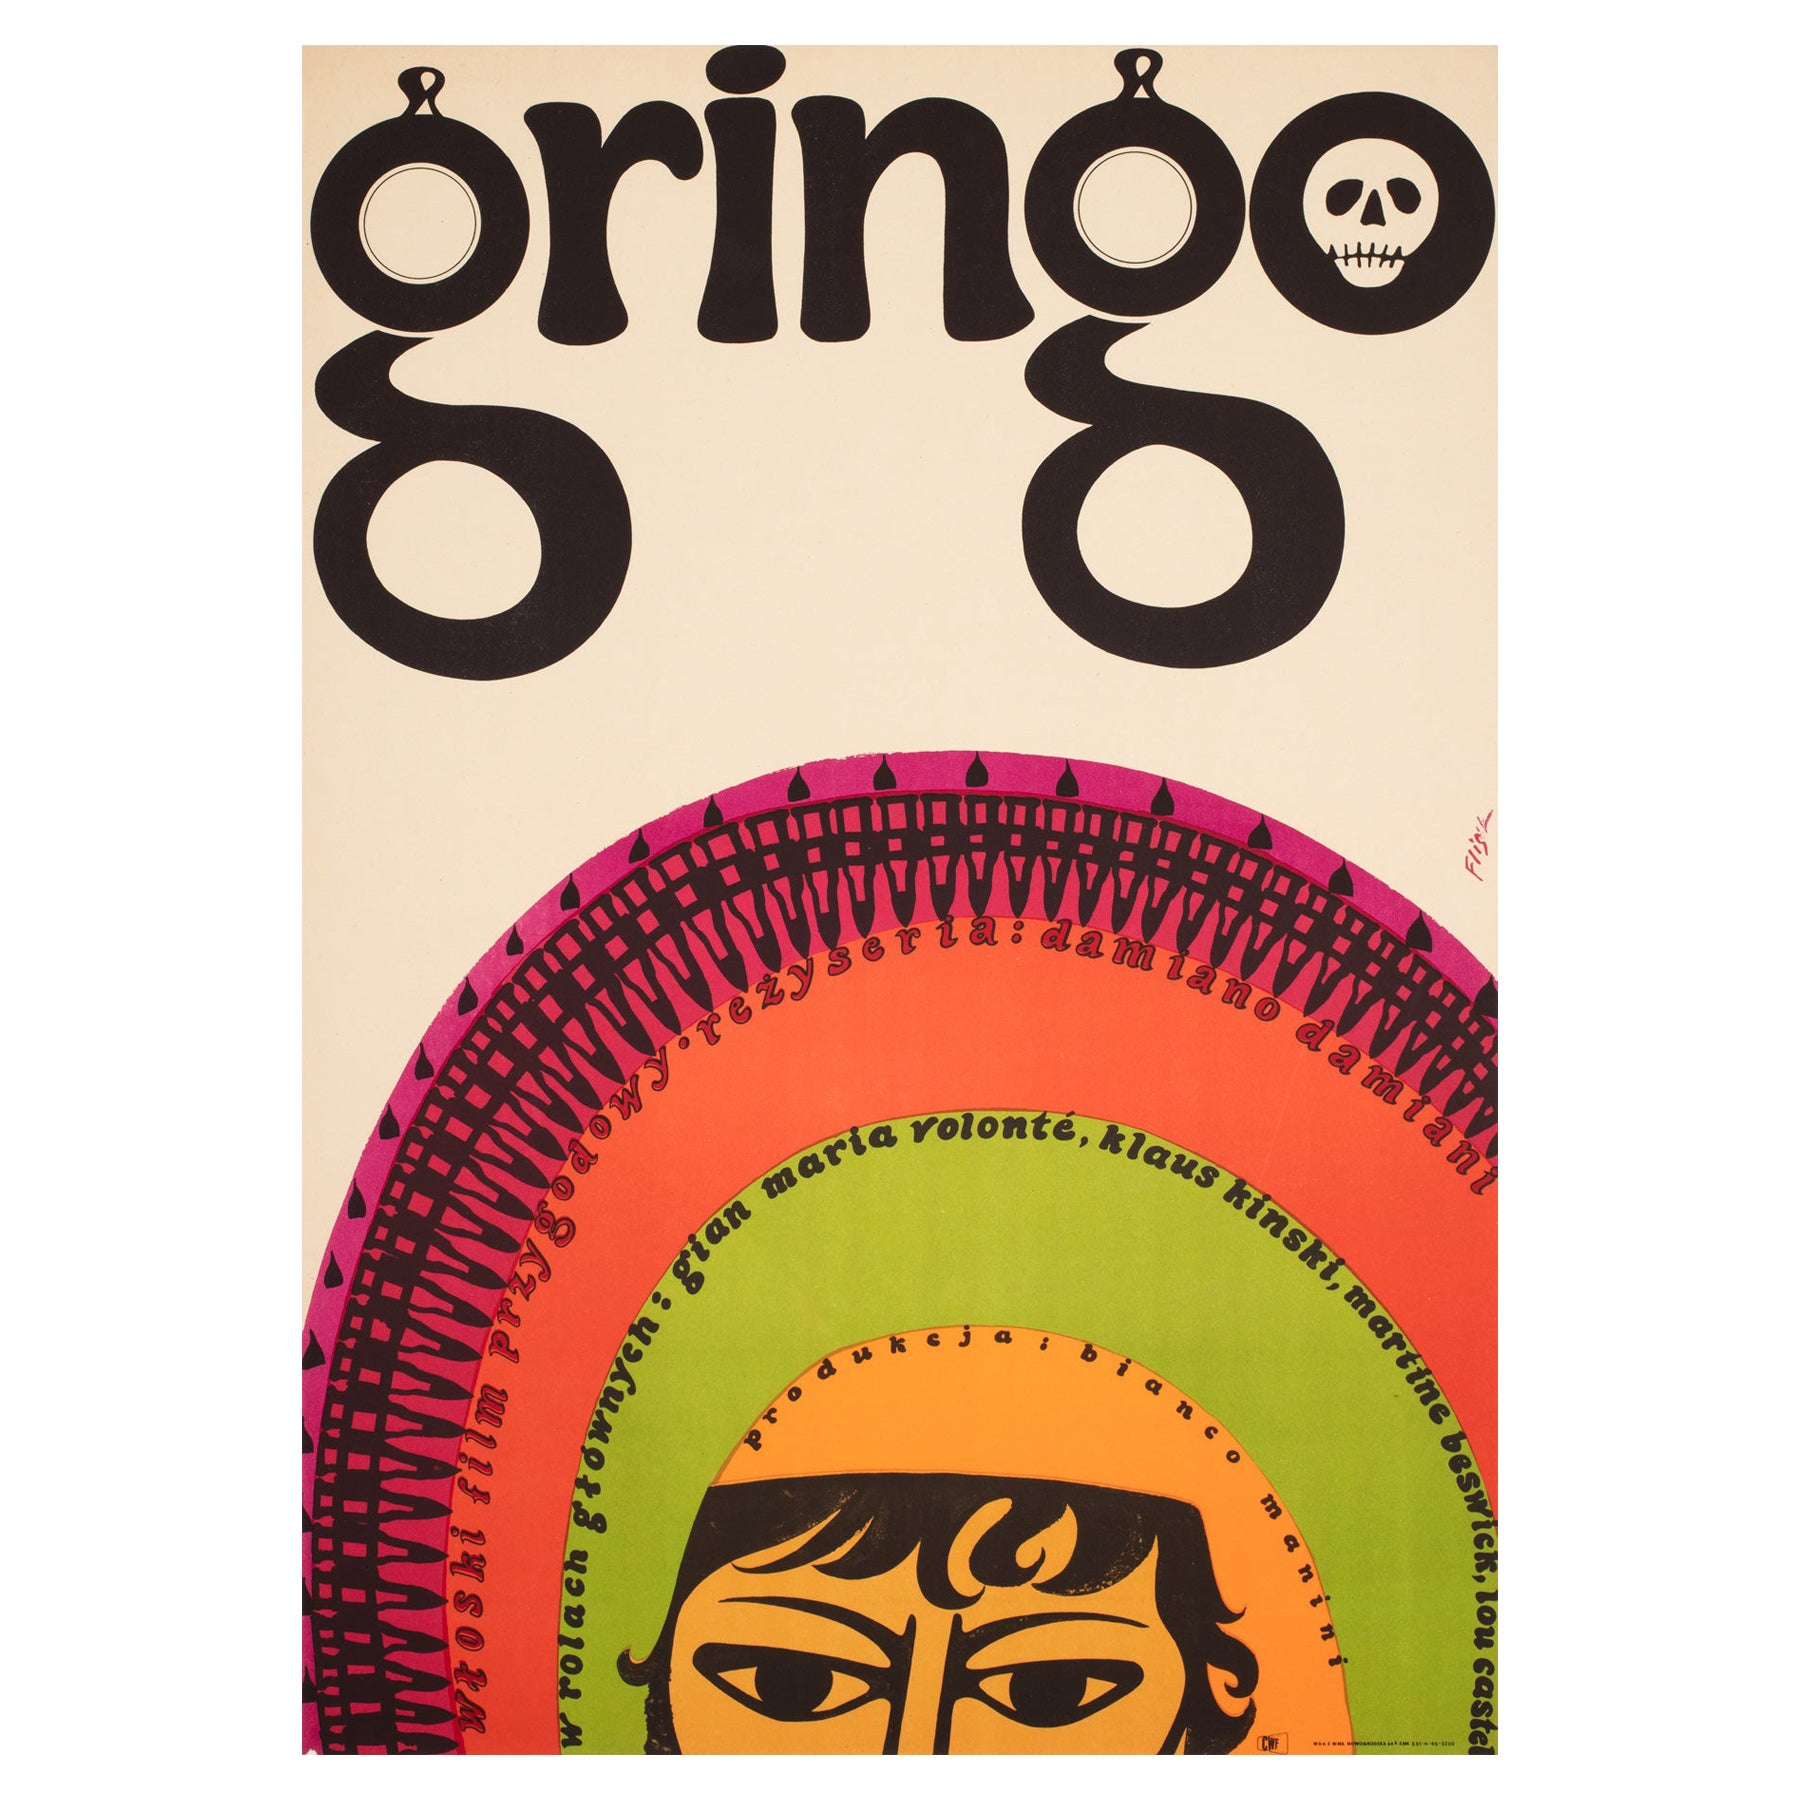 Gringo 1967 Polish A1 Film Movie Poster, Flisak